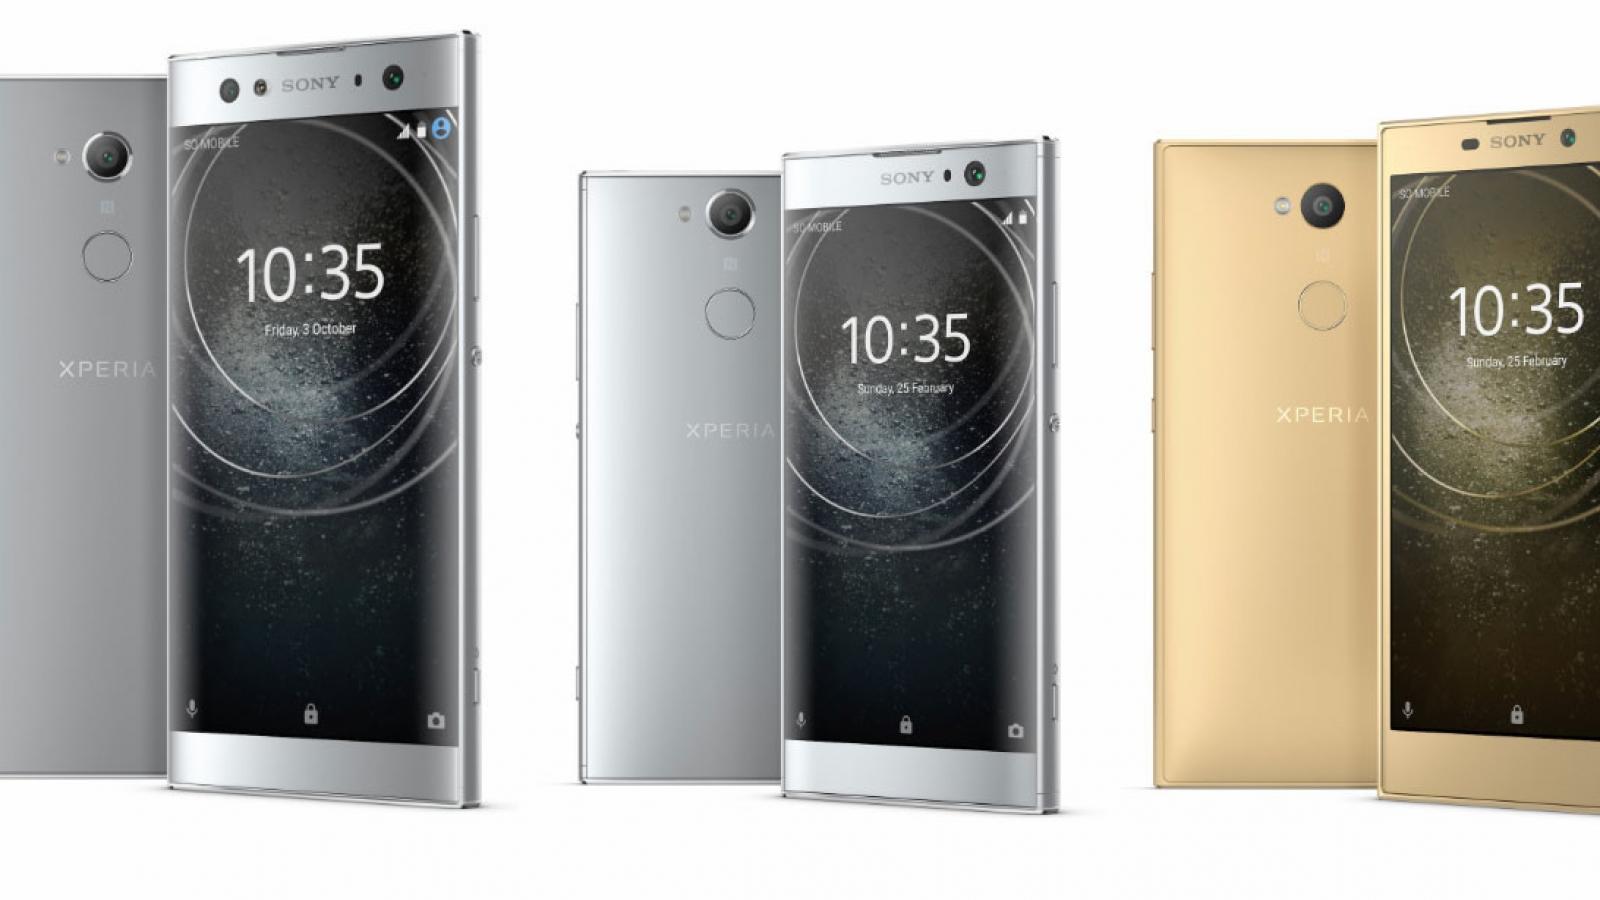 Sony Xperia XA2, Xperia XA2 Ultra and Xperia L2